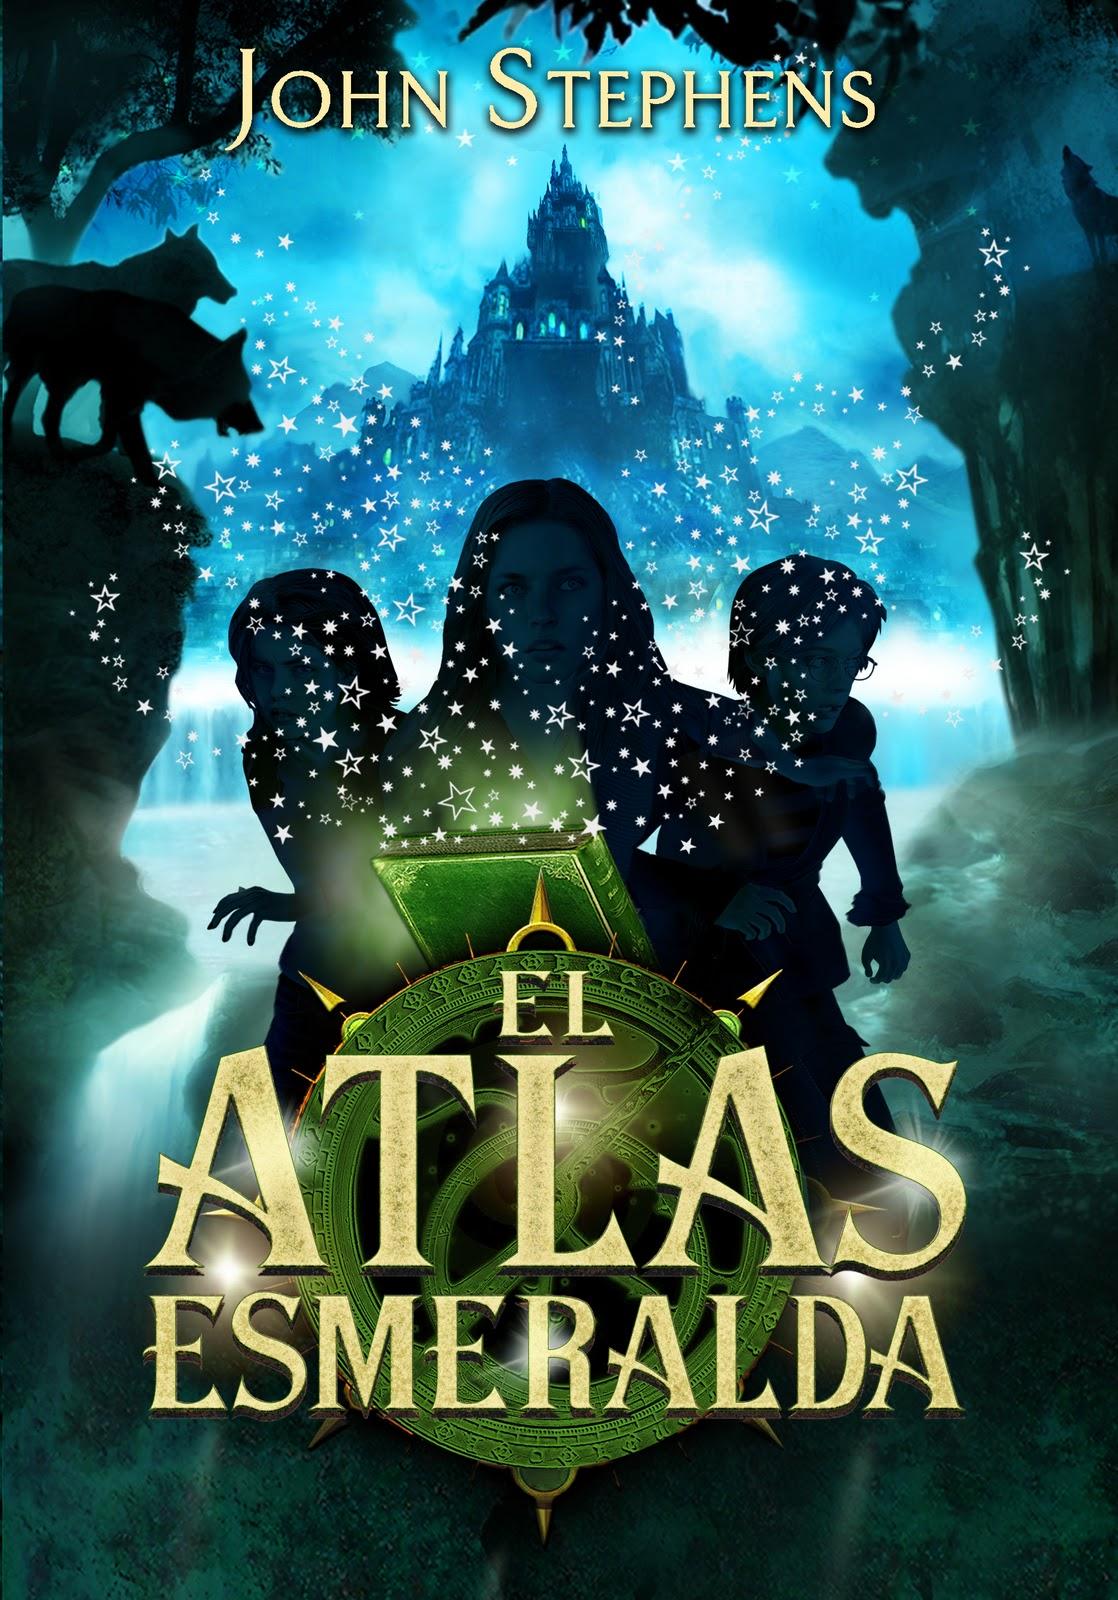 El Atlas Esmeralda, John Stephens